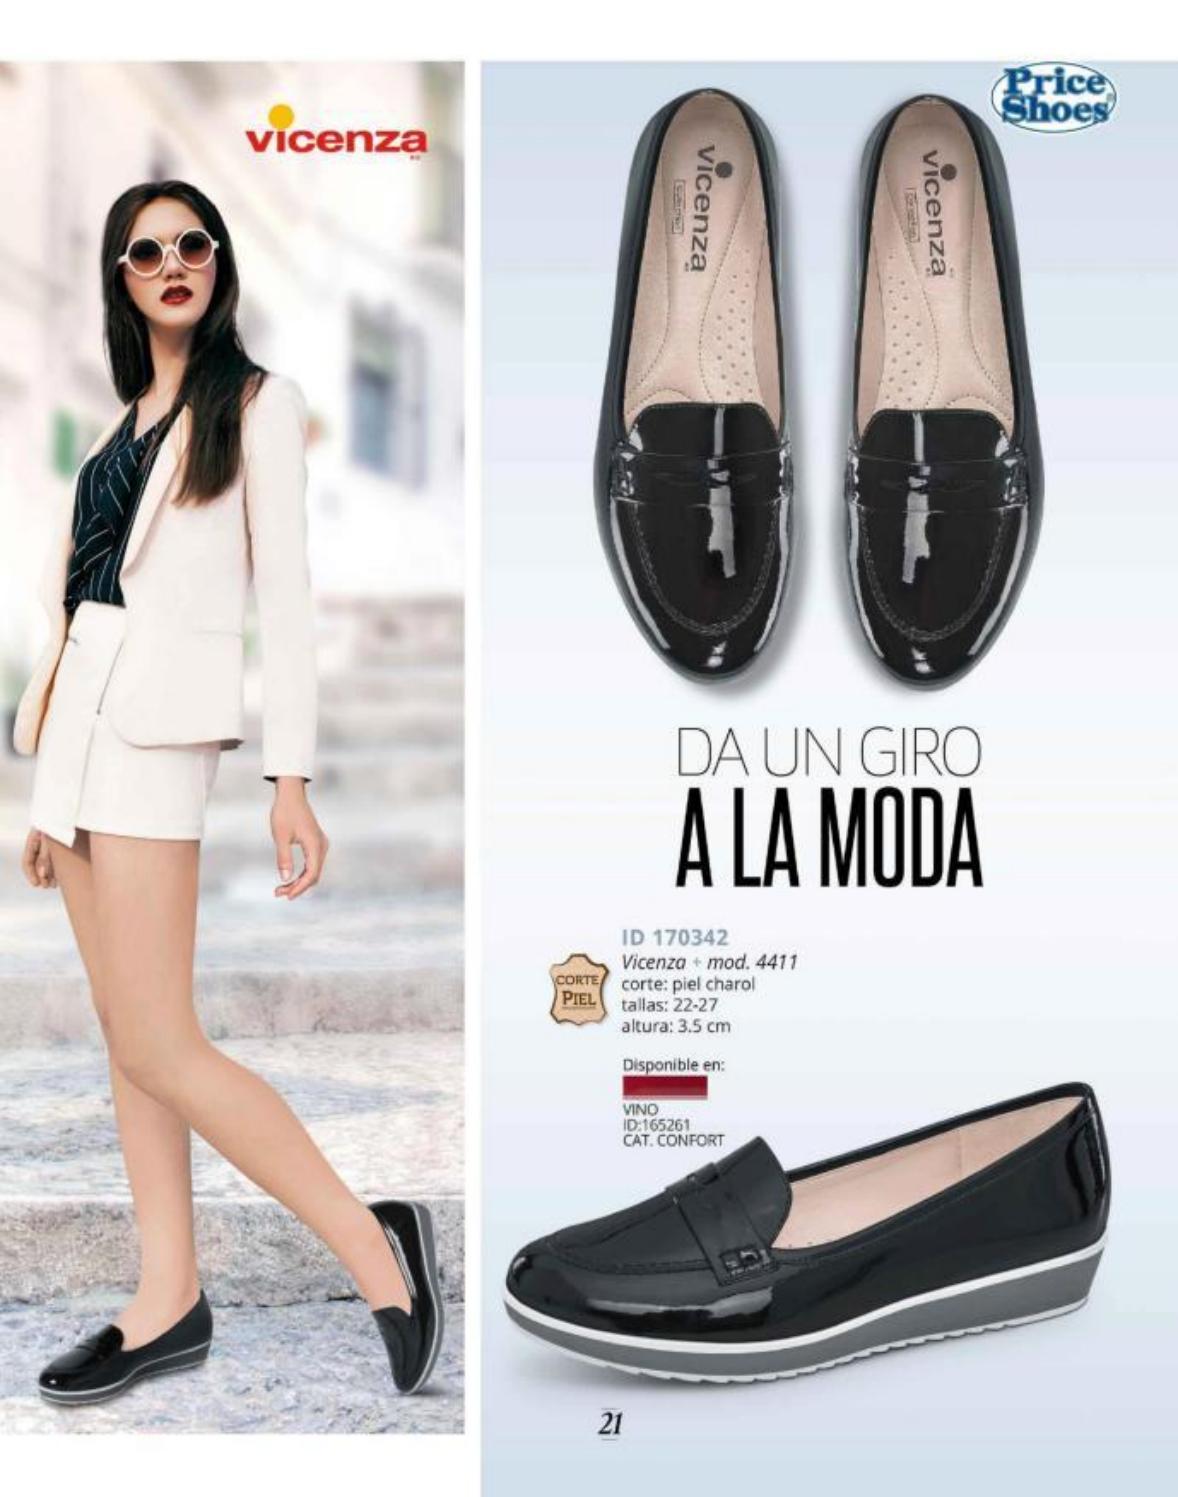 Avance Price Shoes Vestir Casual 17 18 By Catalogos De